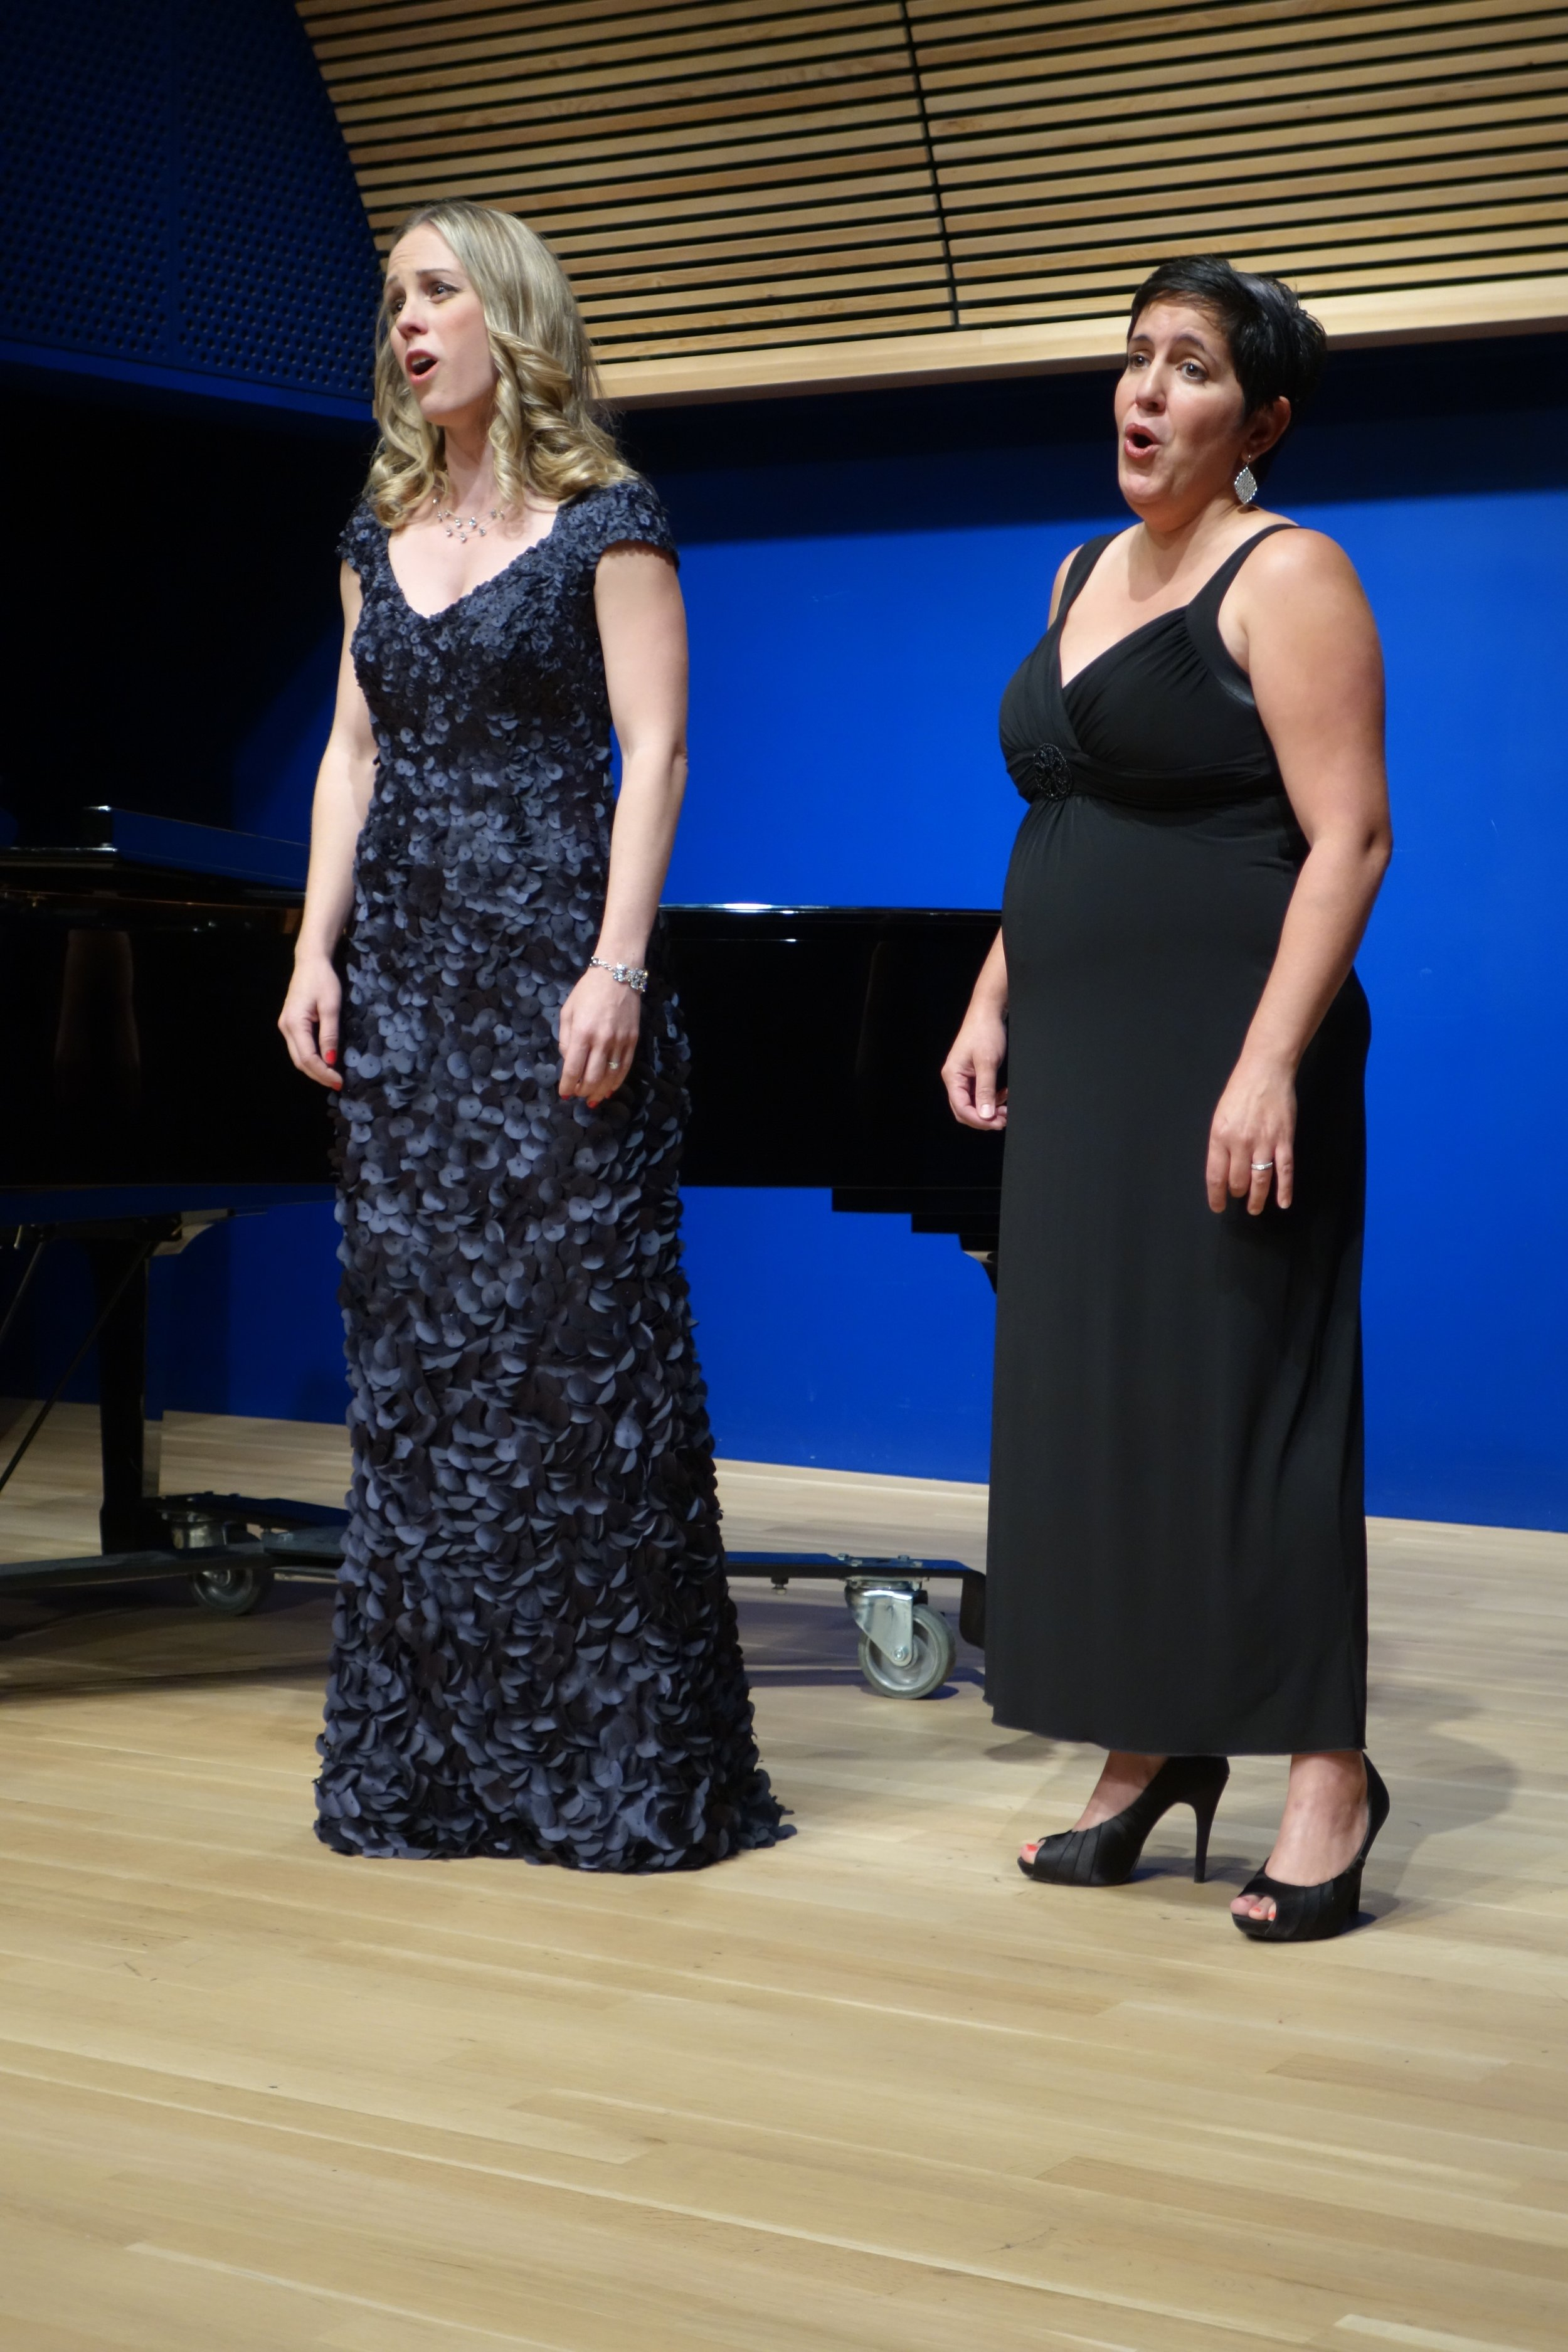 Singing the Lakmé Flower Duet with mezzo soprano Christina Hart